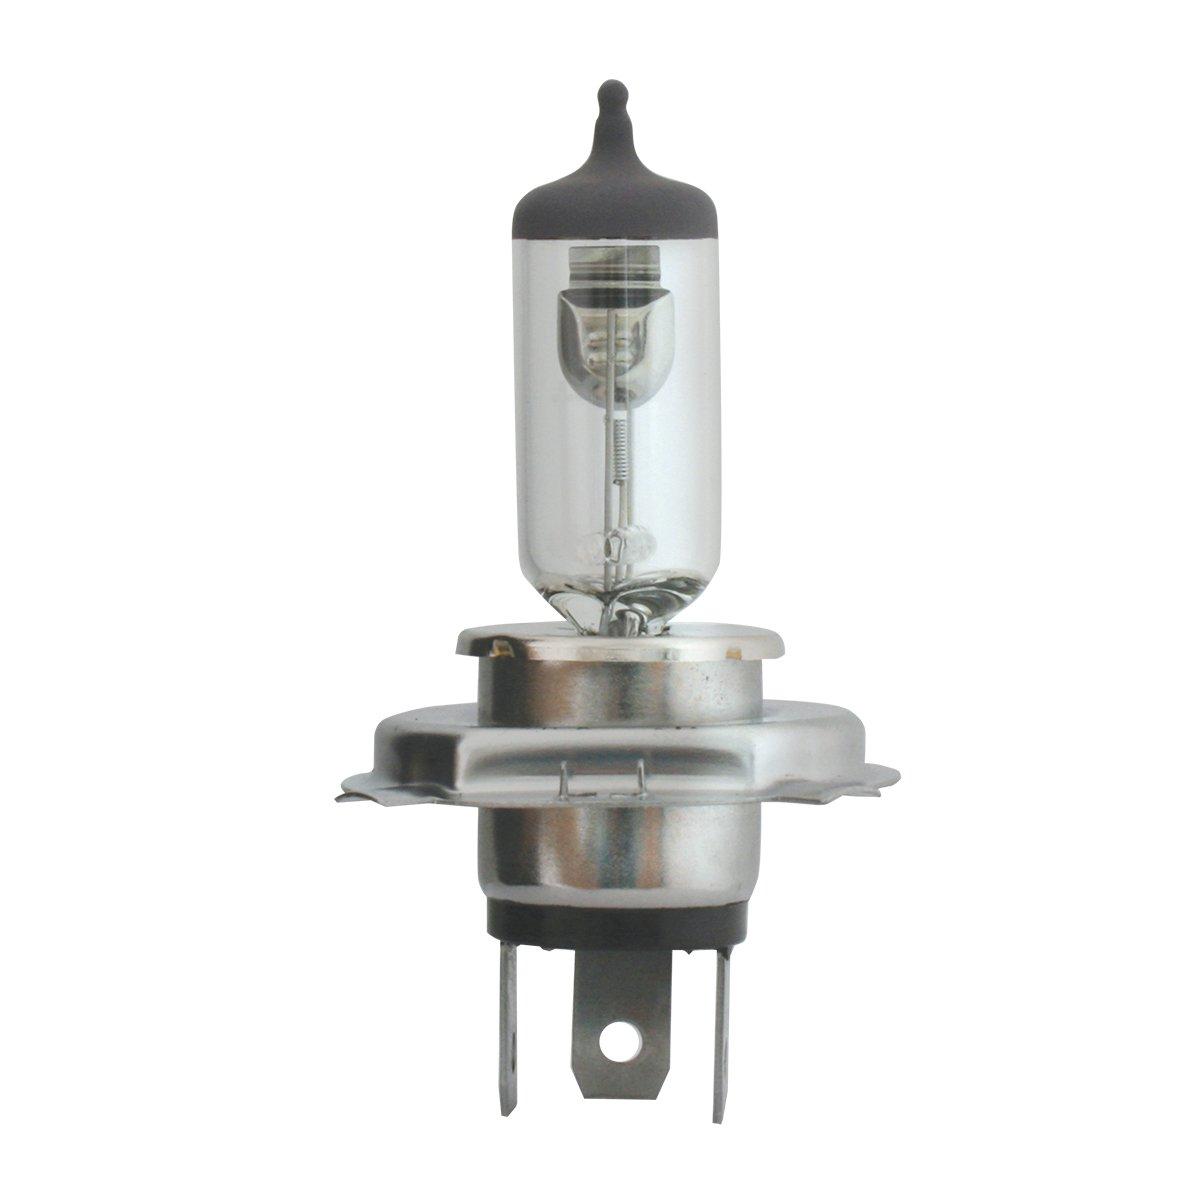 Grand General 82090 H4 Clear Headlight Halogen Bulbs Twin Pack, 12V, 100/90W